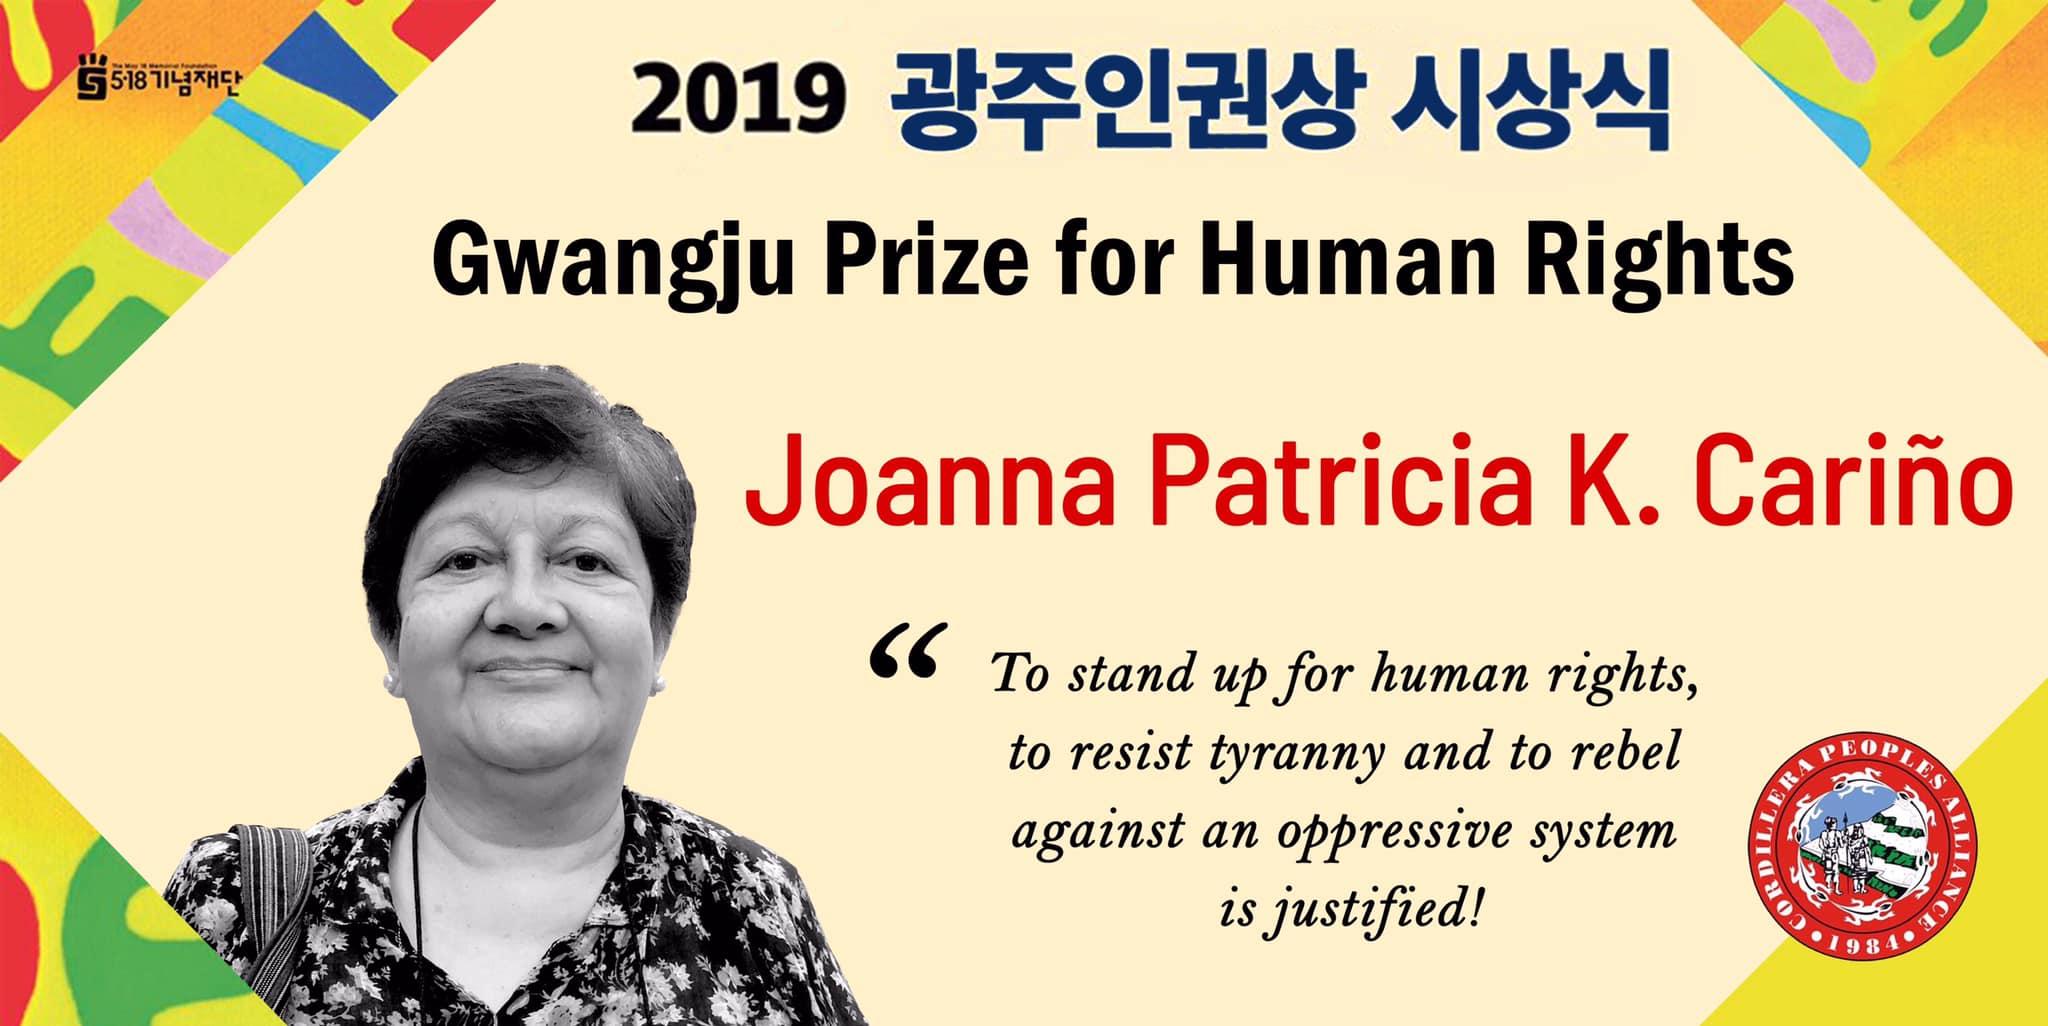 Gwangju Prize for Human Rights